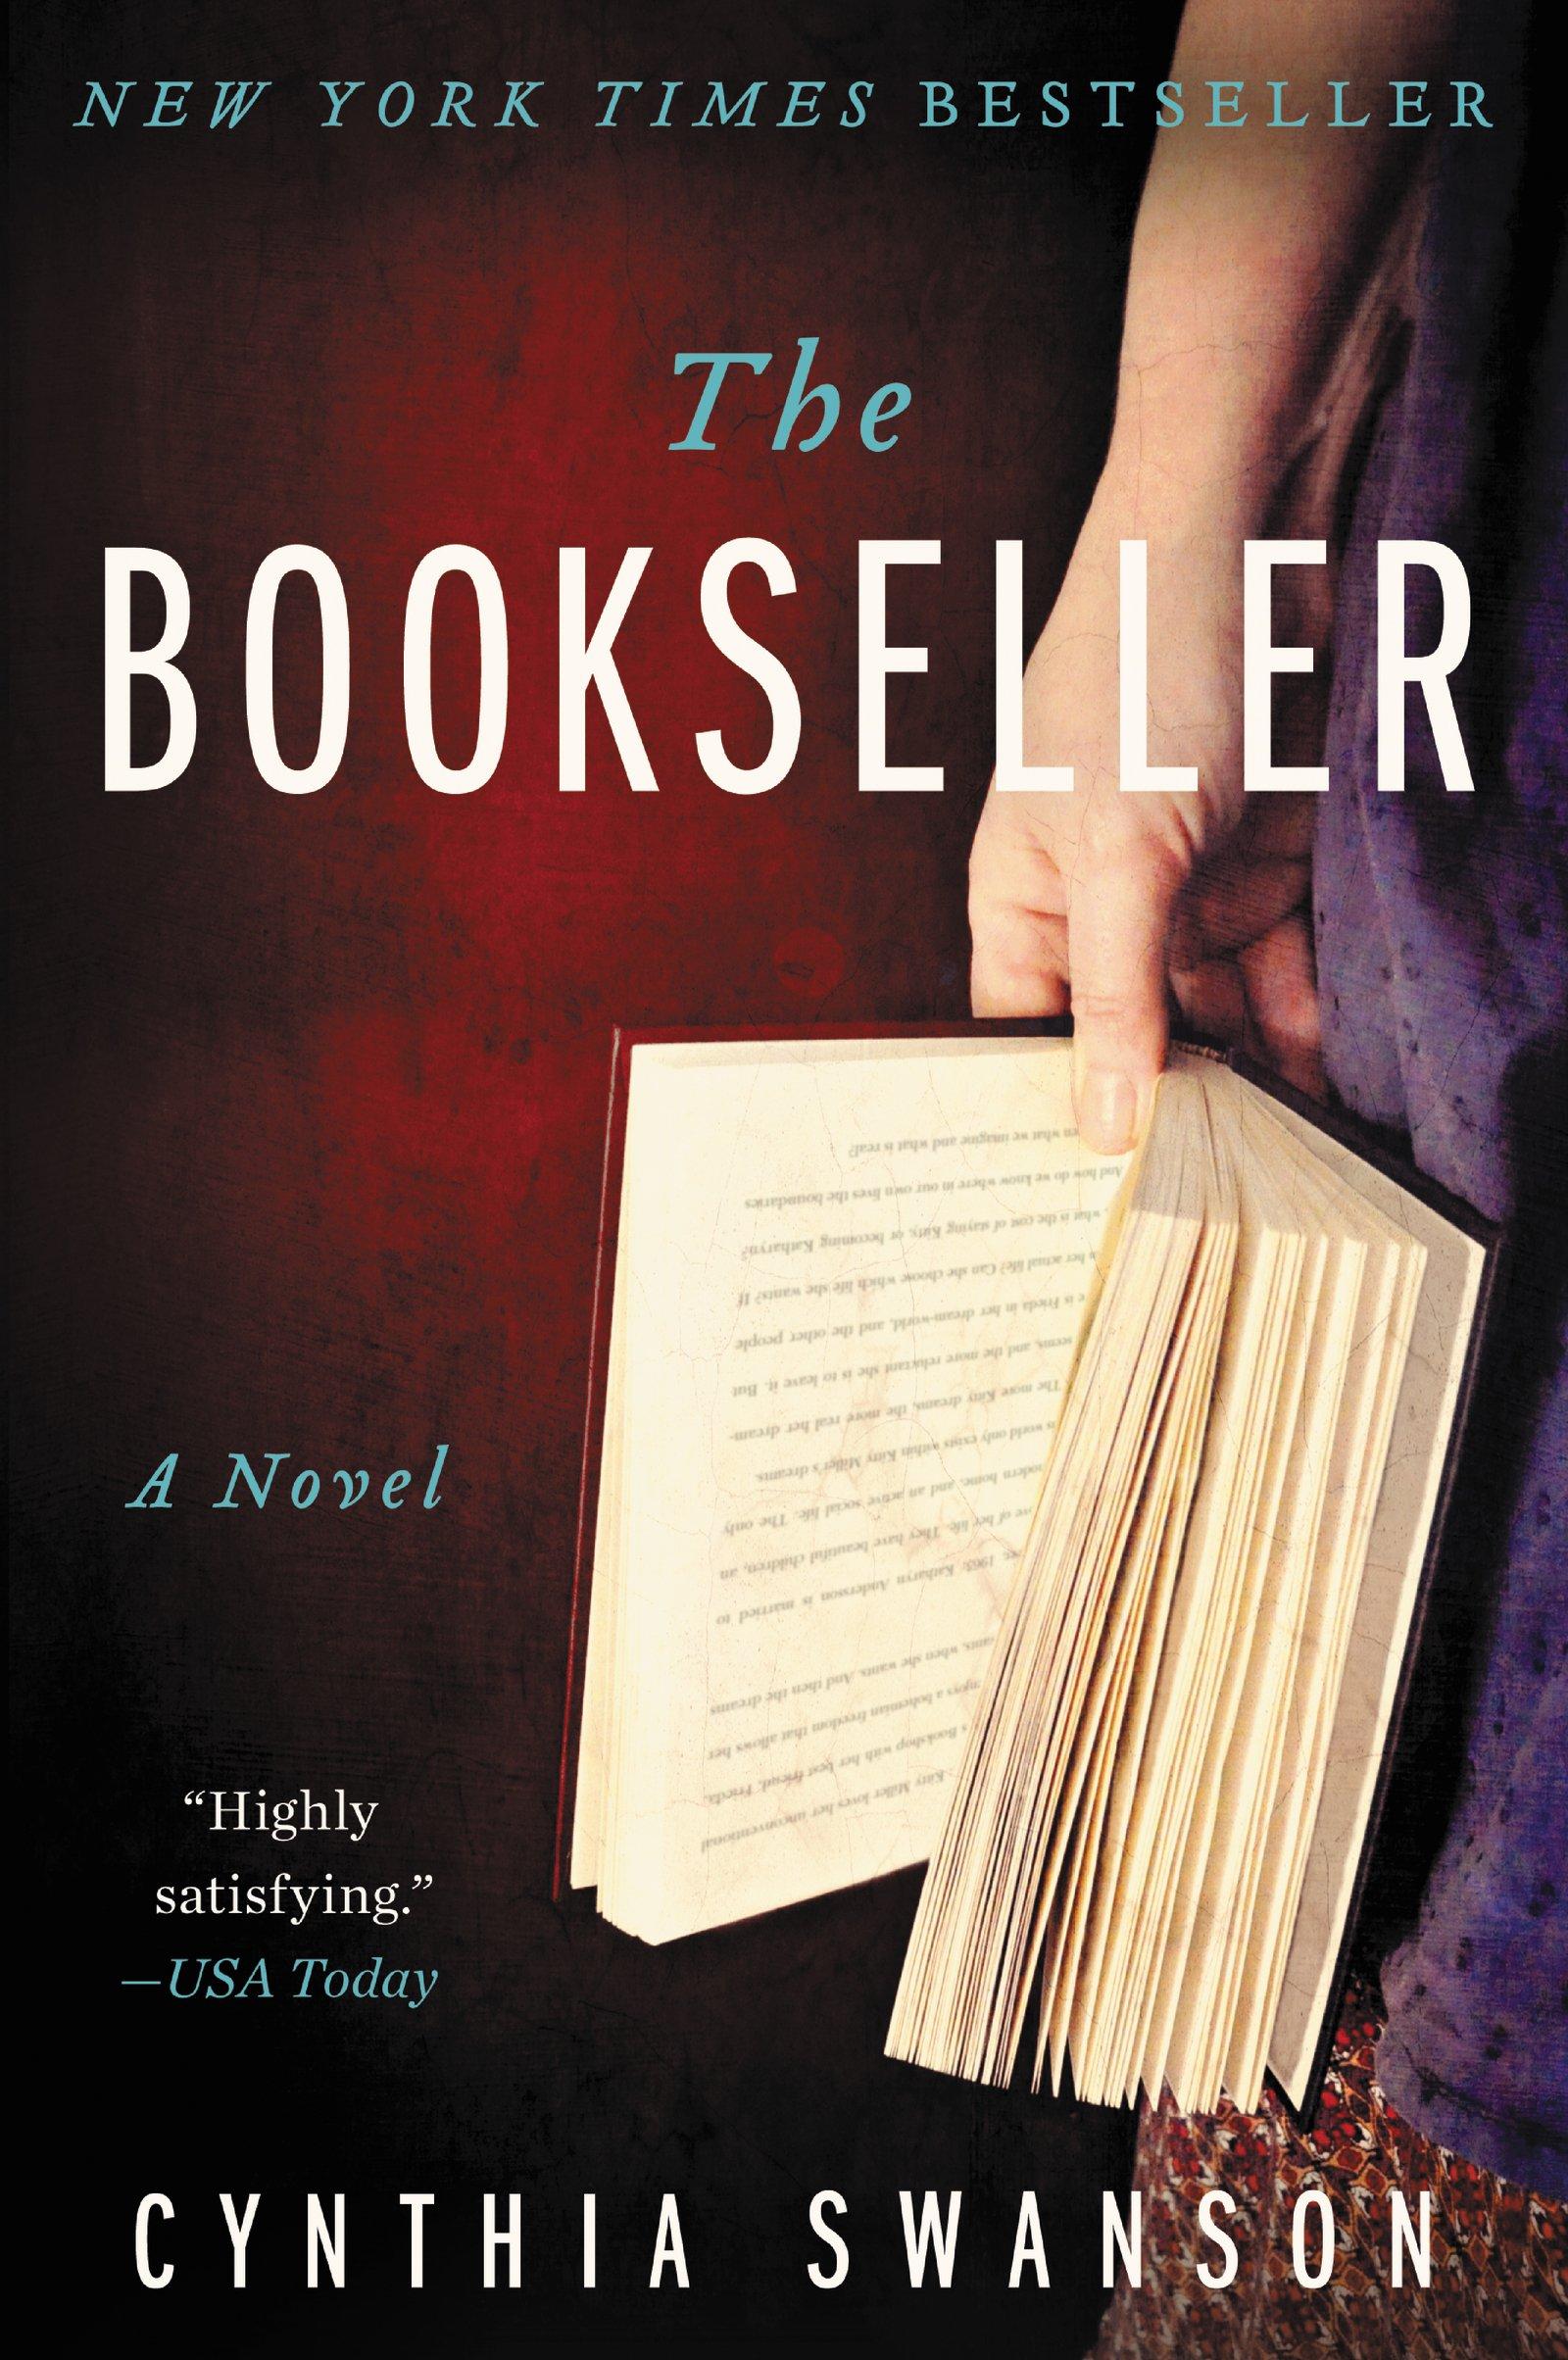 The Bookseller: A Novel: Cynthia Swanson: 9780062333018: Amazon: Books